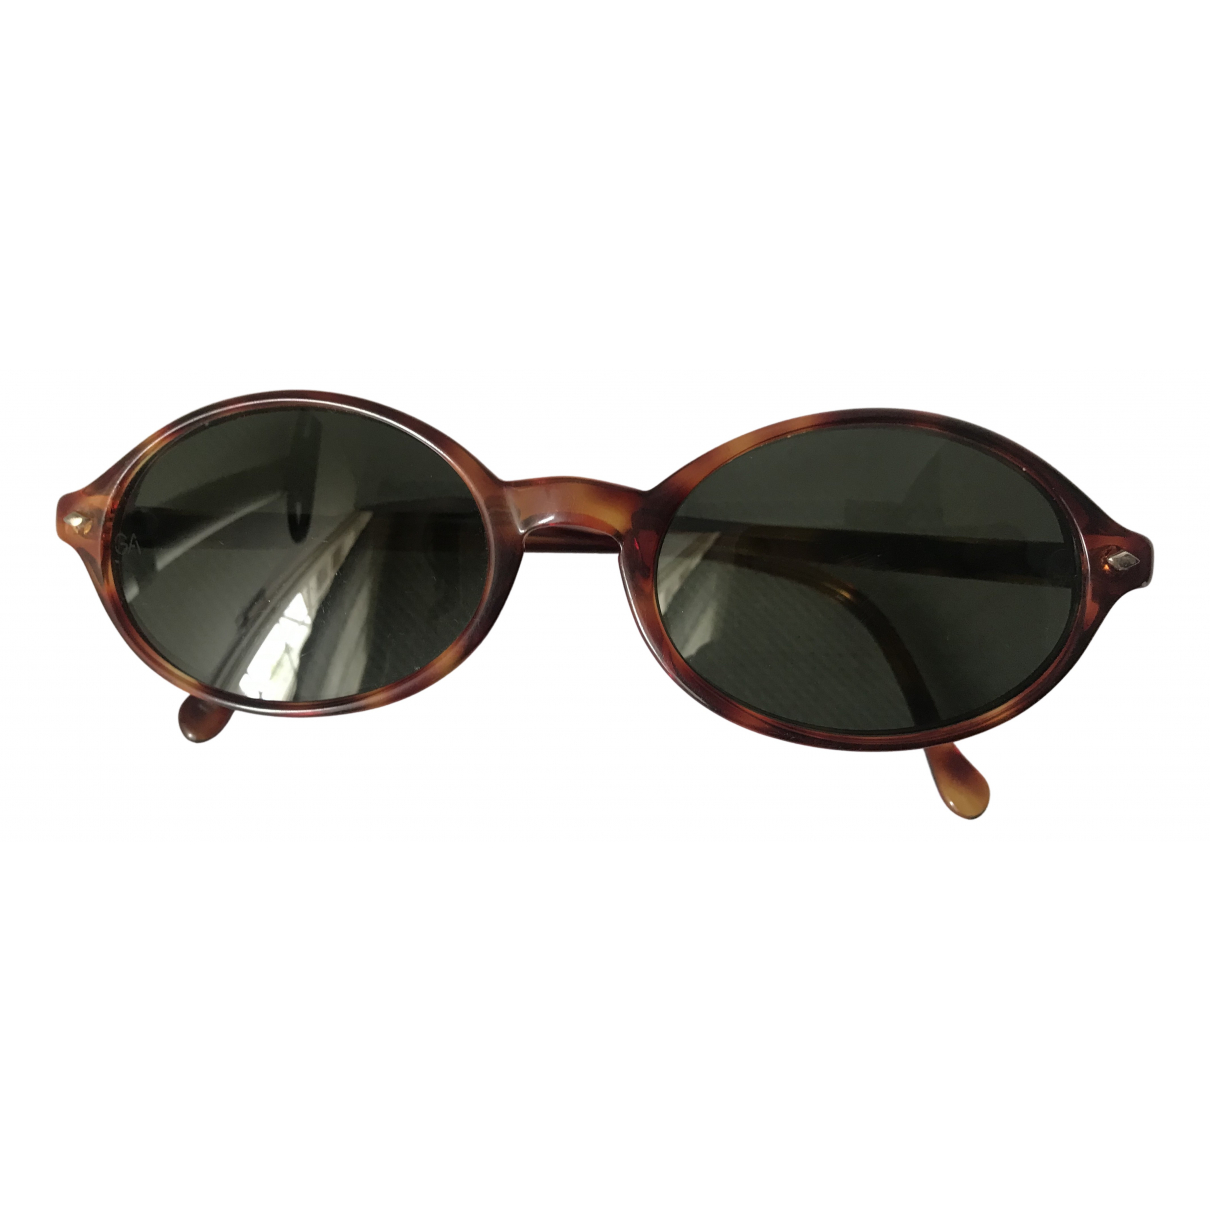 Giorgio Armani N Brown Sunglasses for Men N